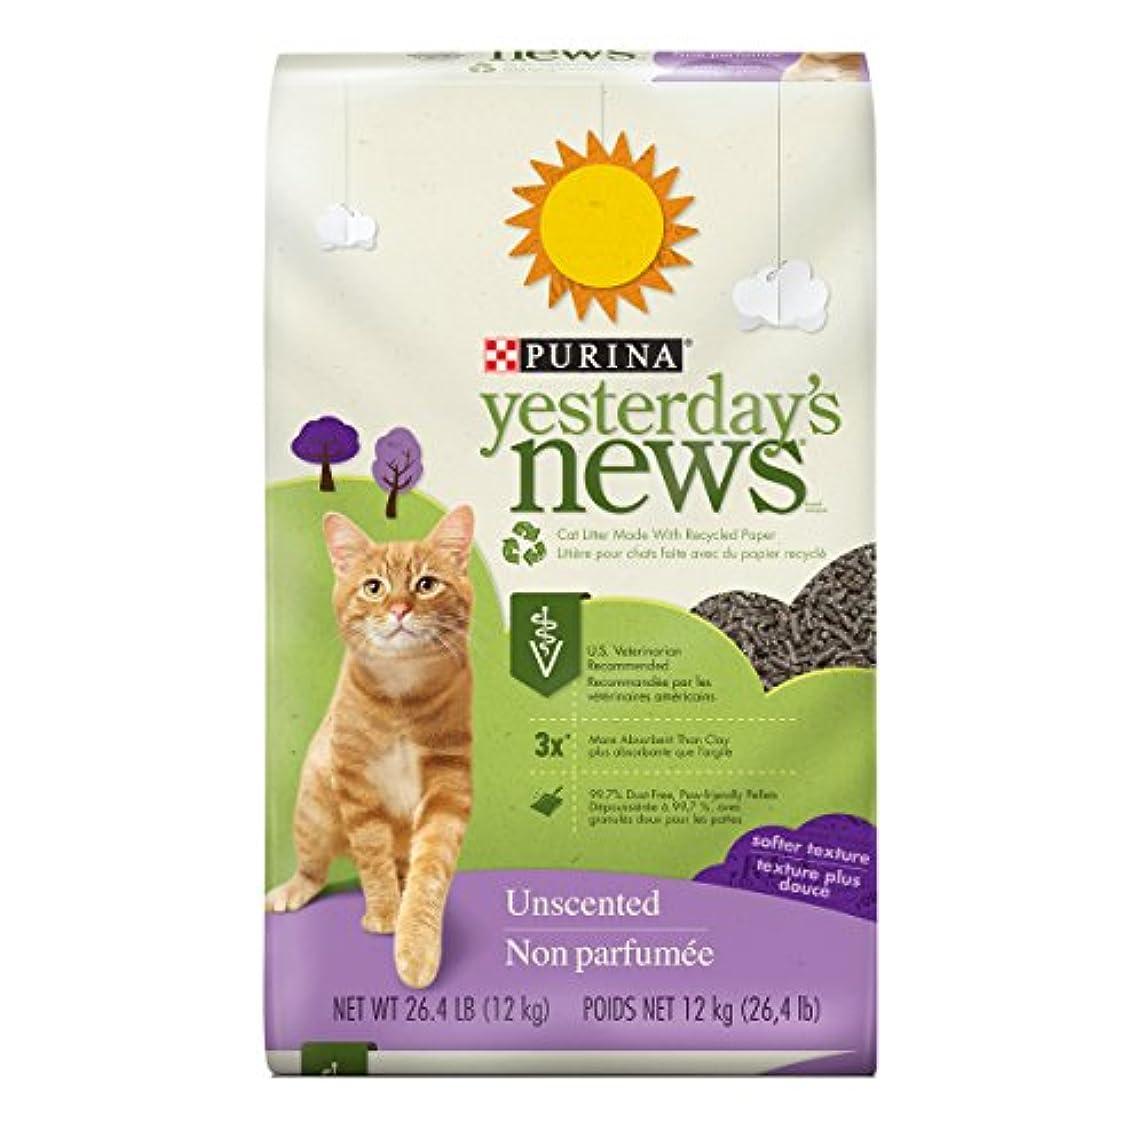 Yesterday's News Purina Non Clumping Paper Cat Litter; Softer Texture Unscented Cat Litter - 26.4 lb. Bag